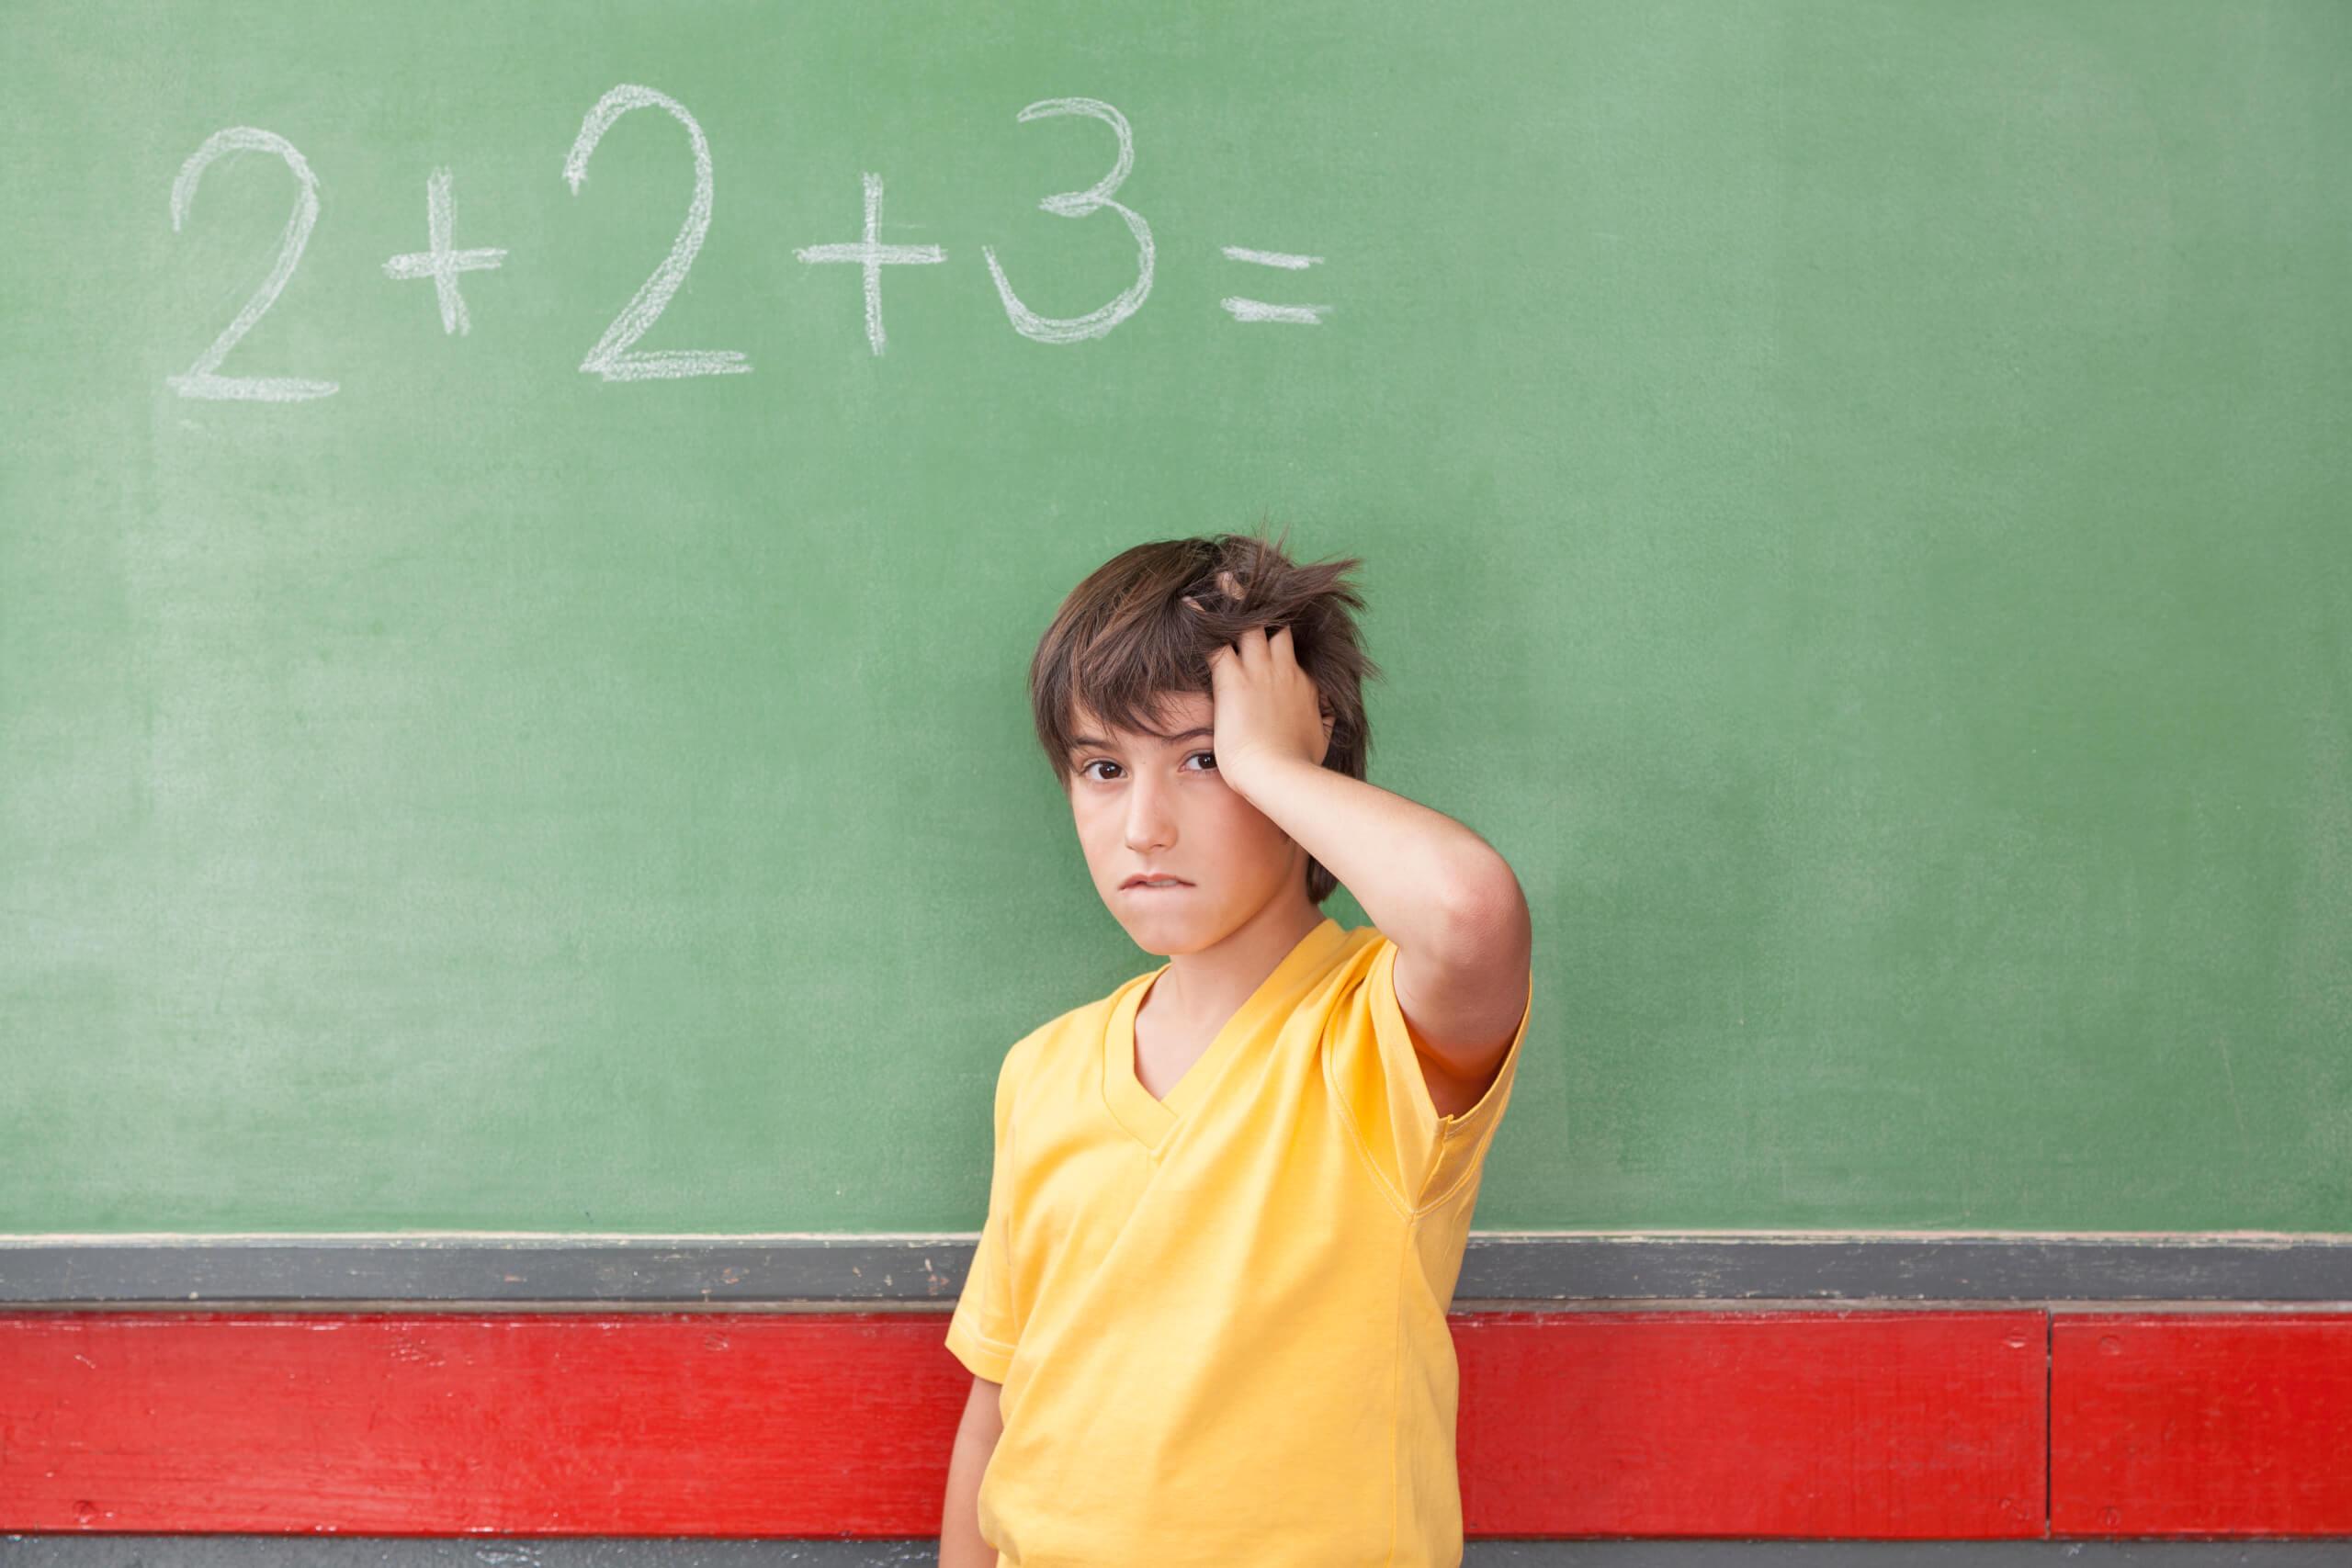 boy worried about math Bse5wGaRUg